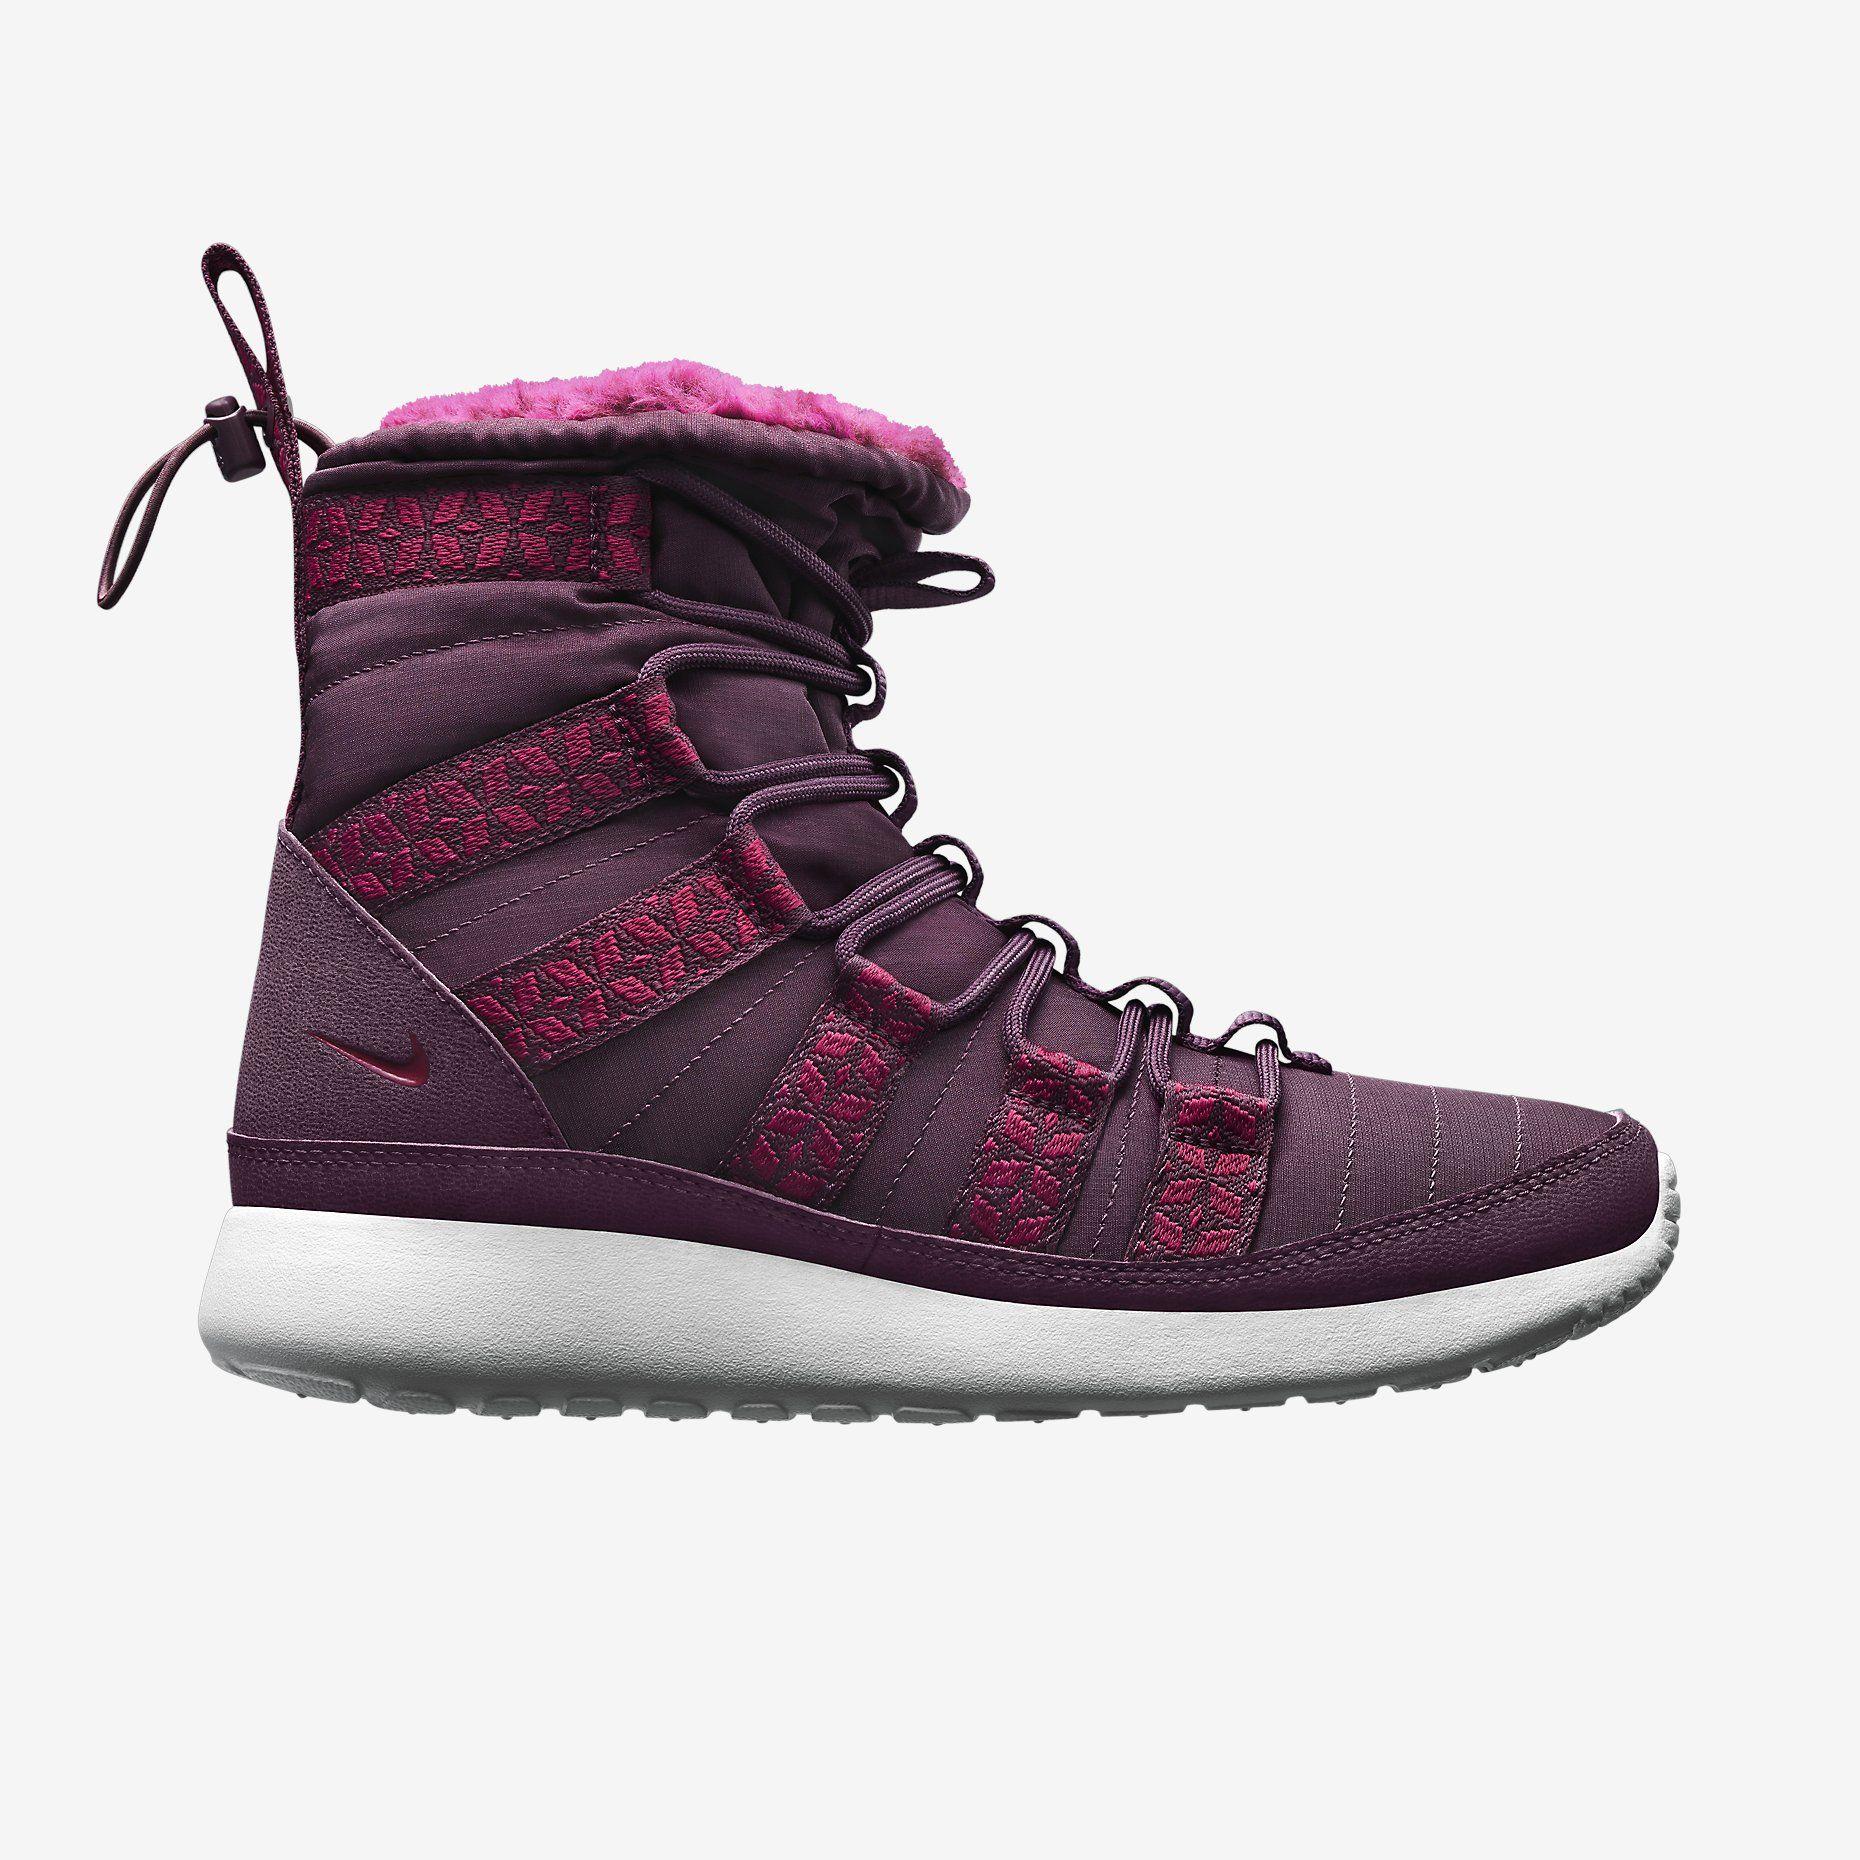 newest 0d20d 1050e Nike Roshe Run Hi SneakerBoot Women s SneakerBoot. Nike Store